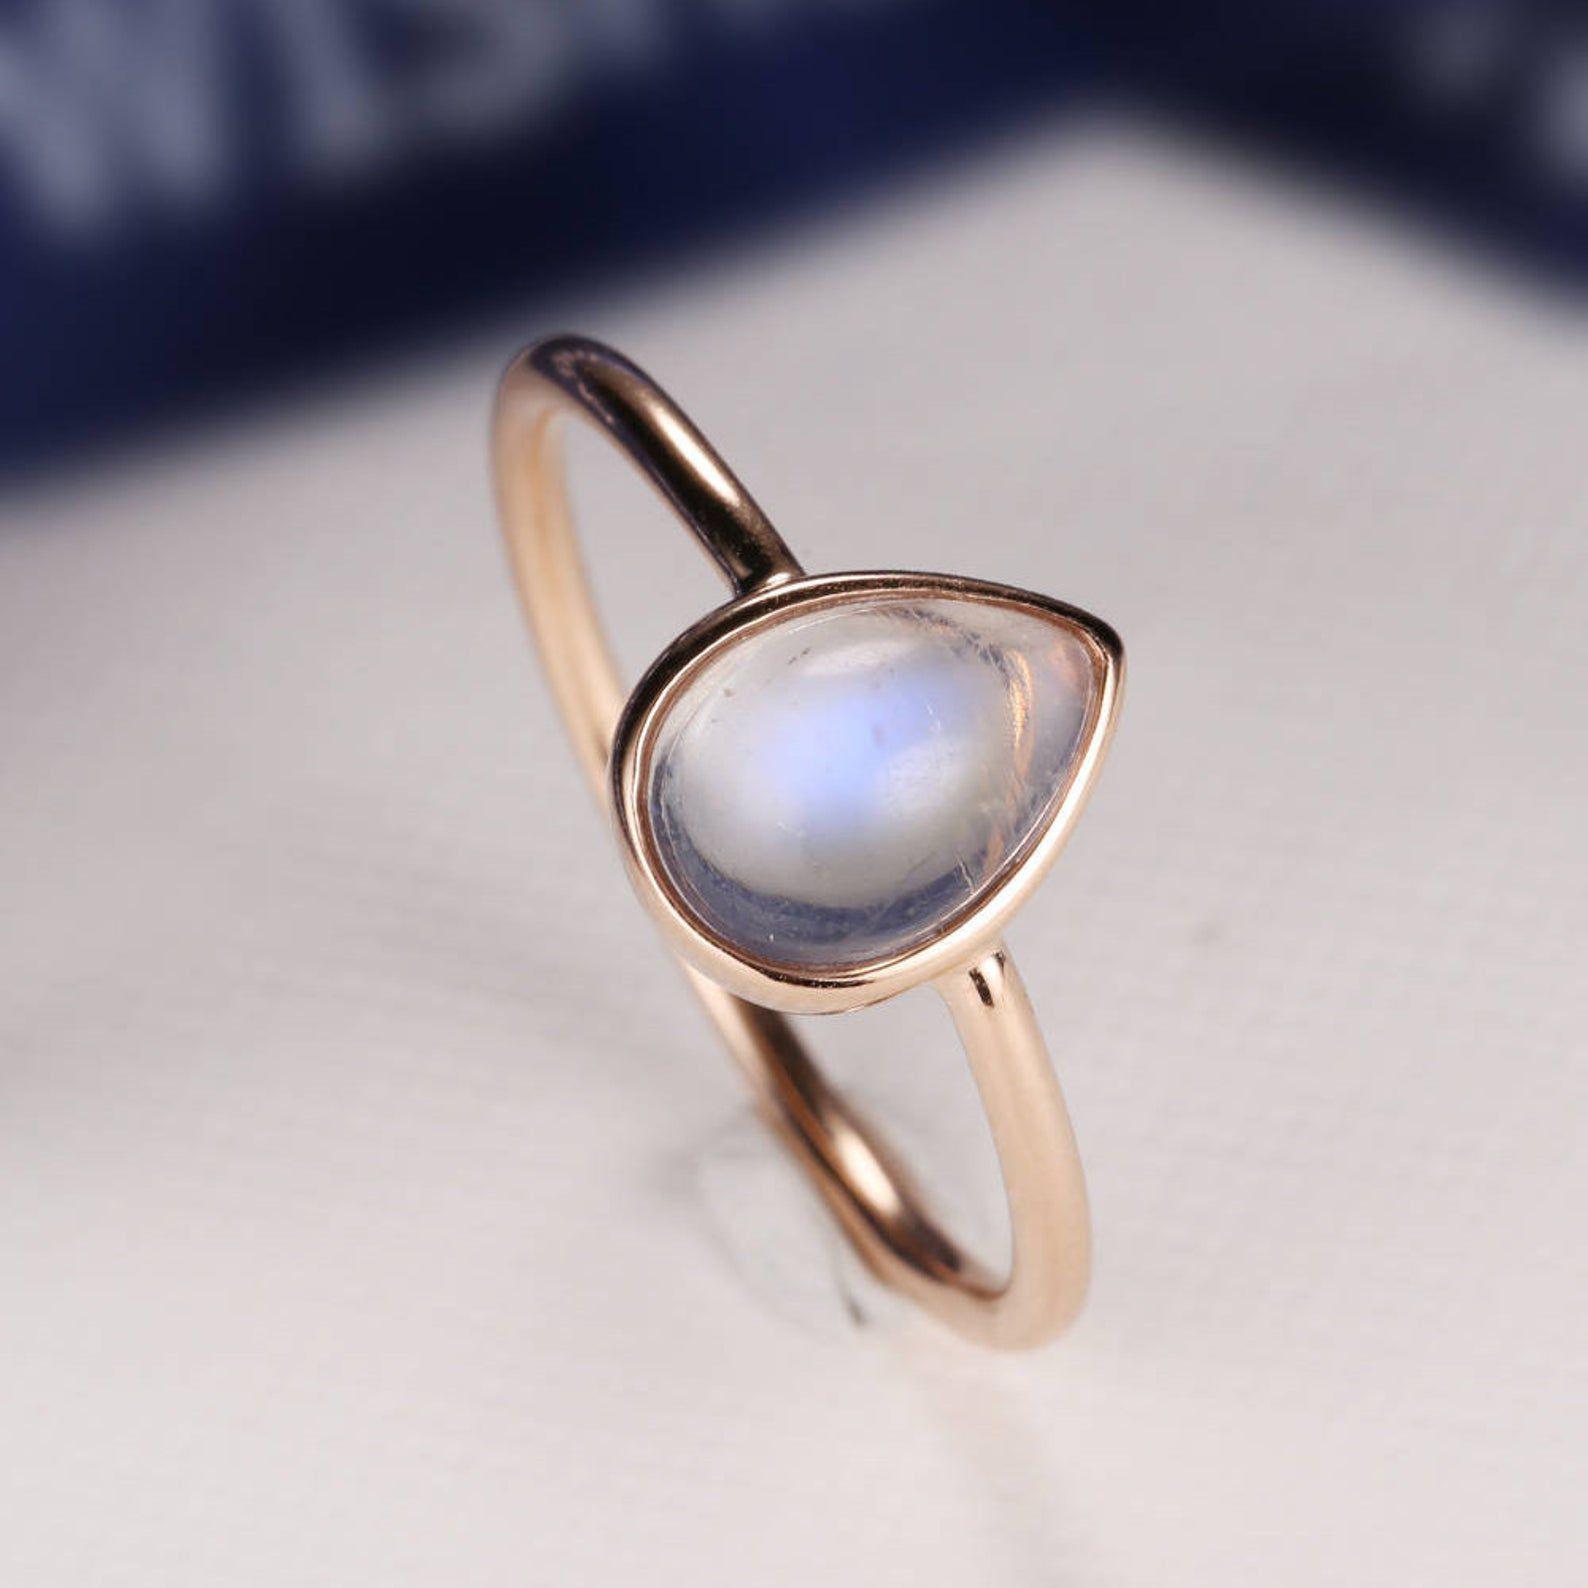 Pear shaped moonstone ring